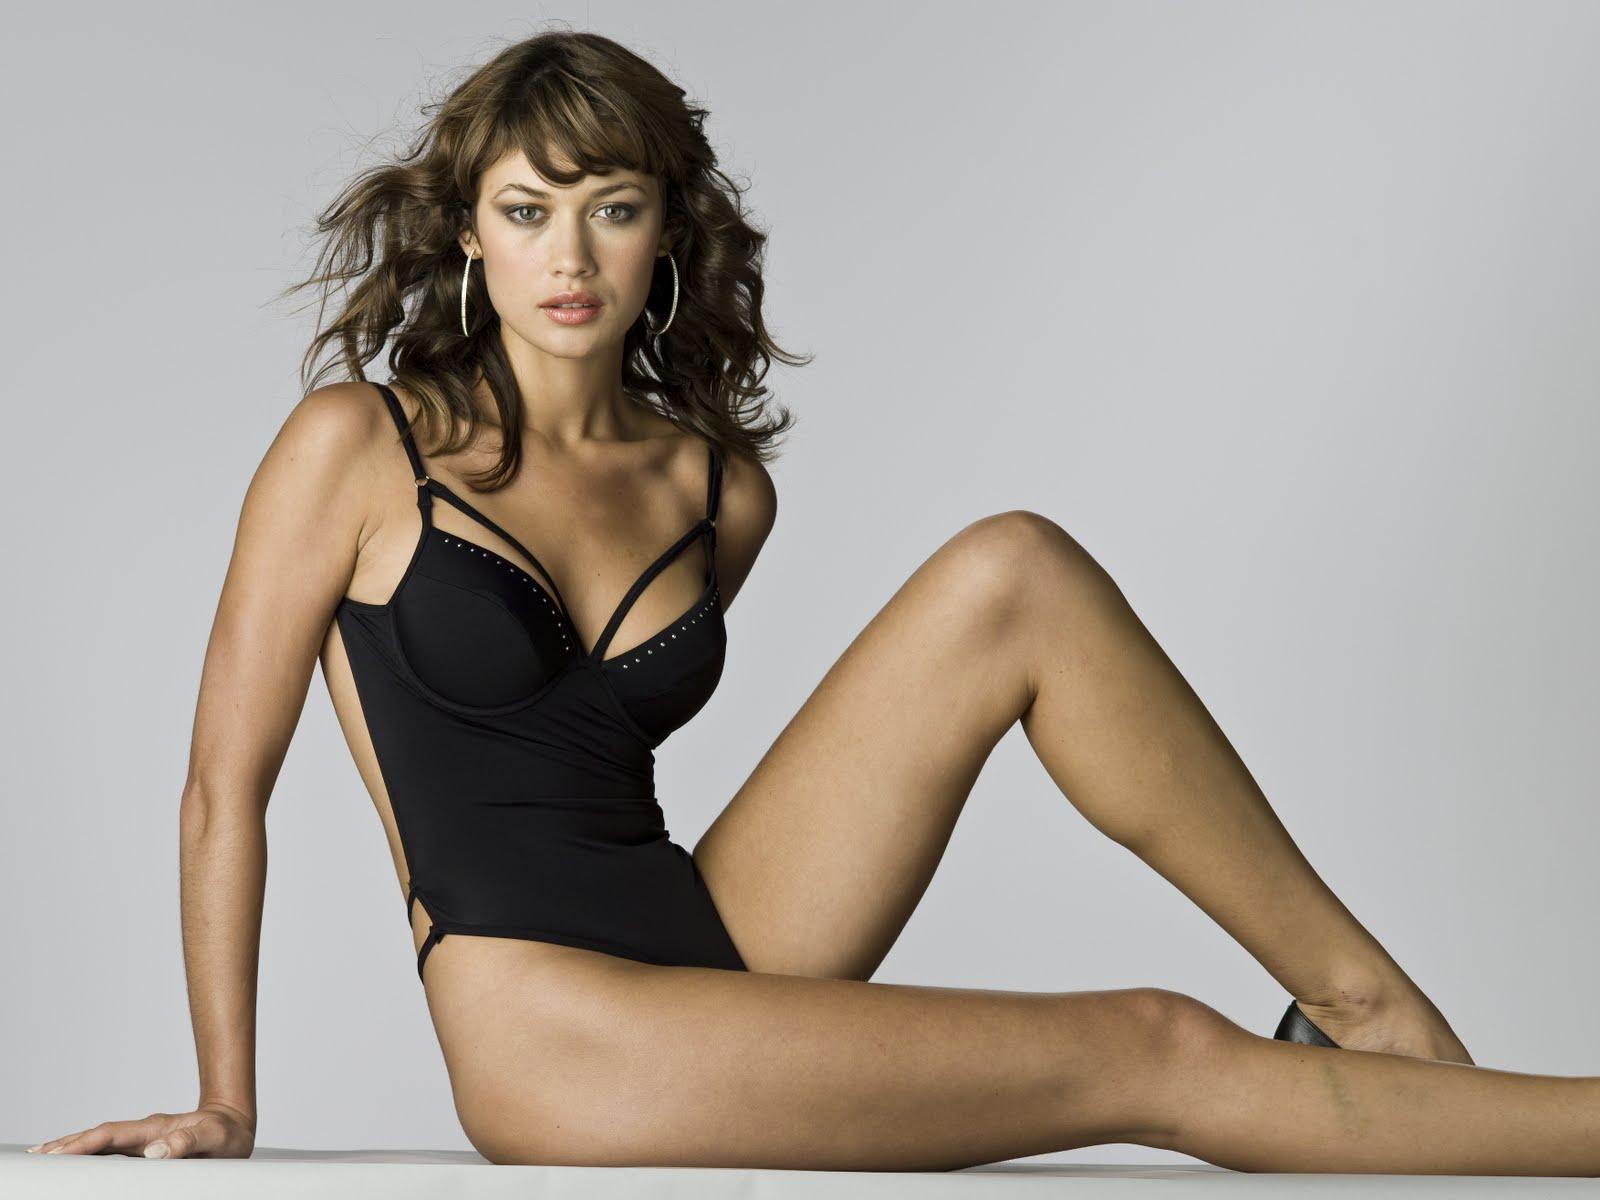 Olga Kurylenko – Actresses – The premium gallery of HQ Pictures ...